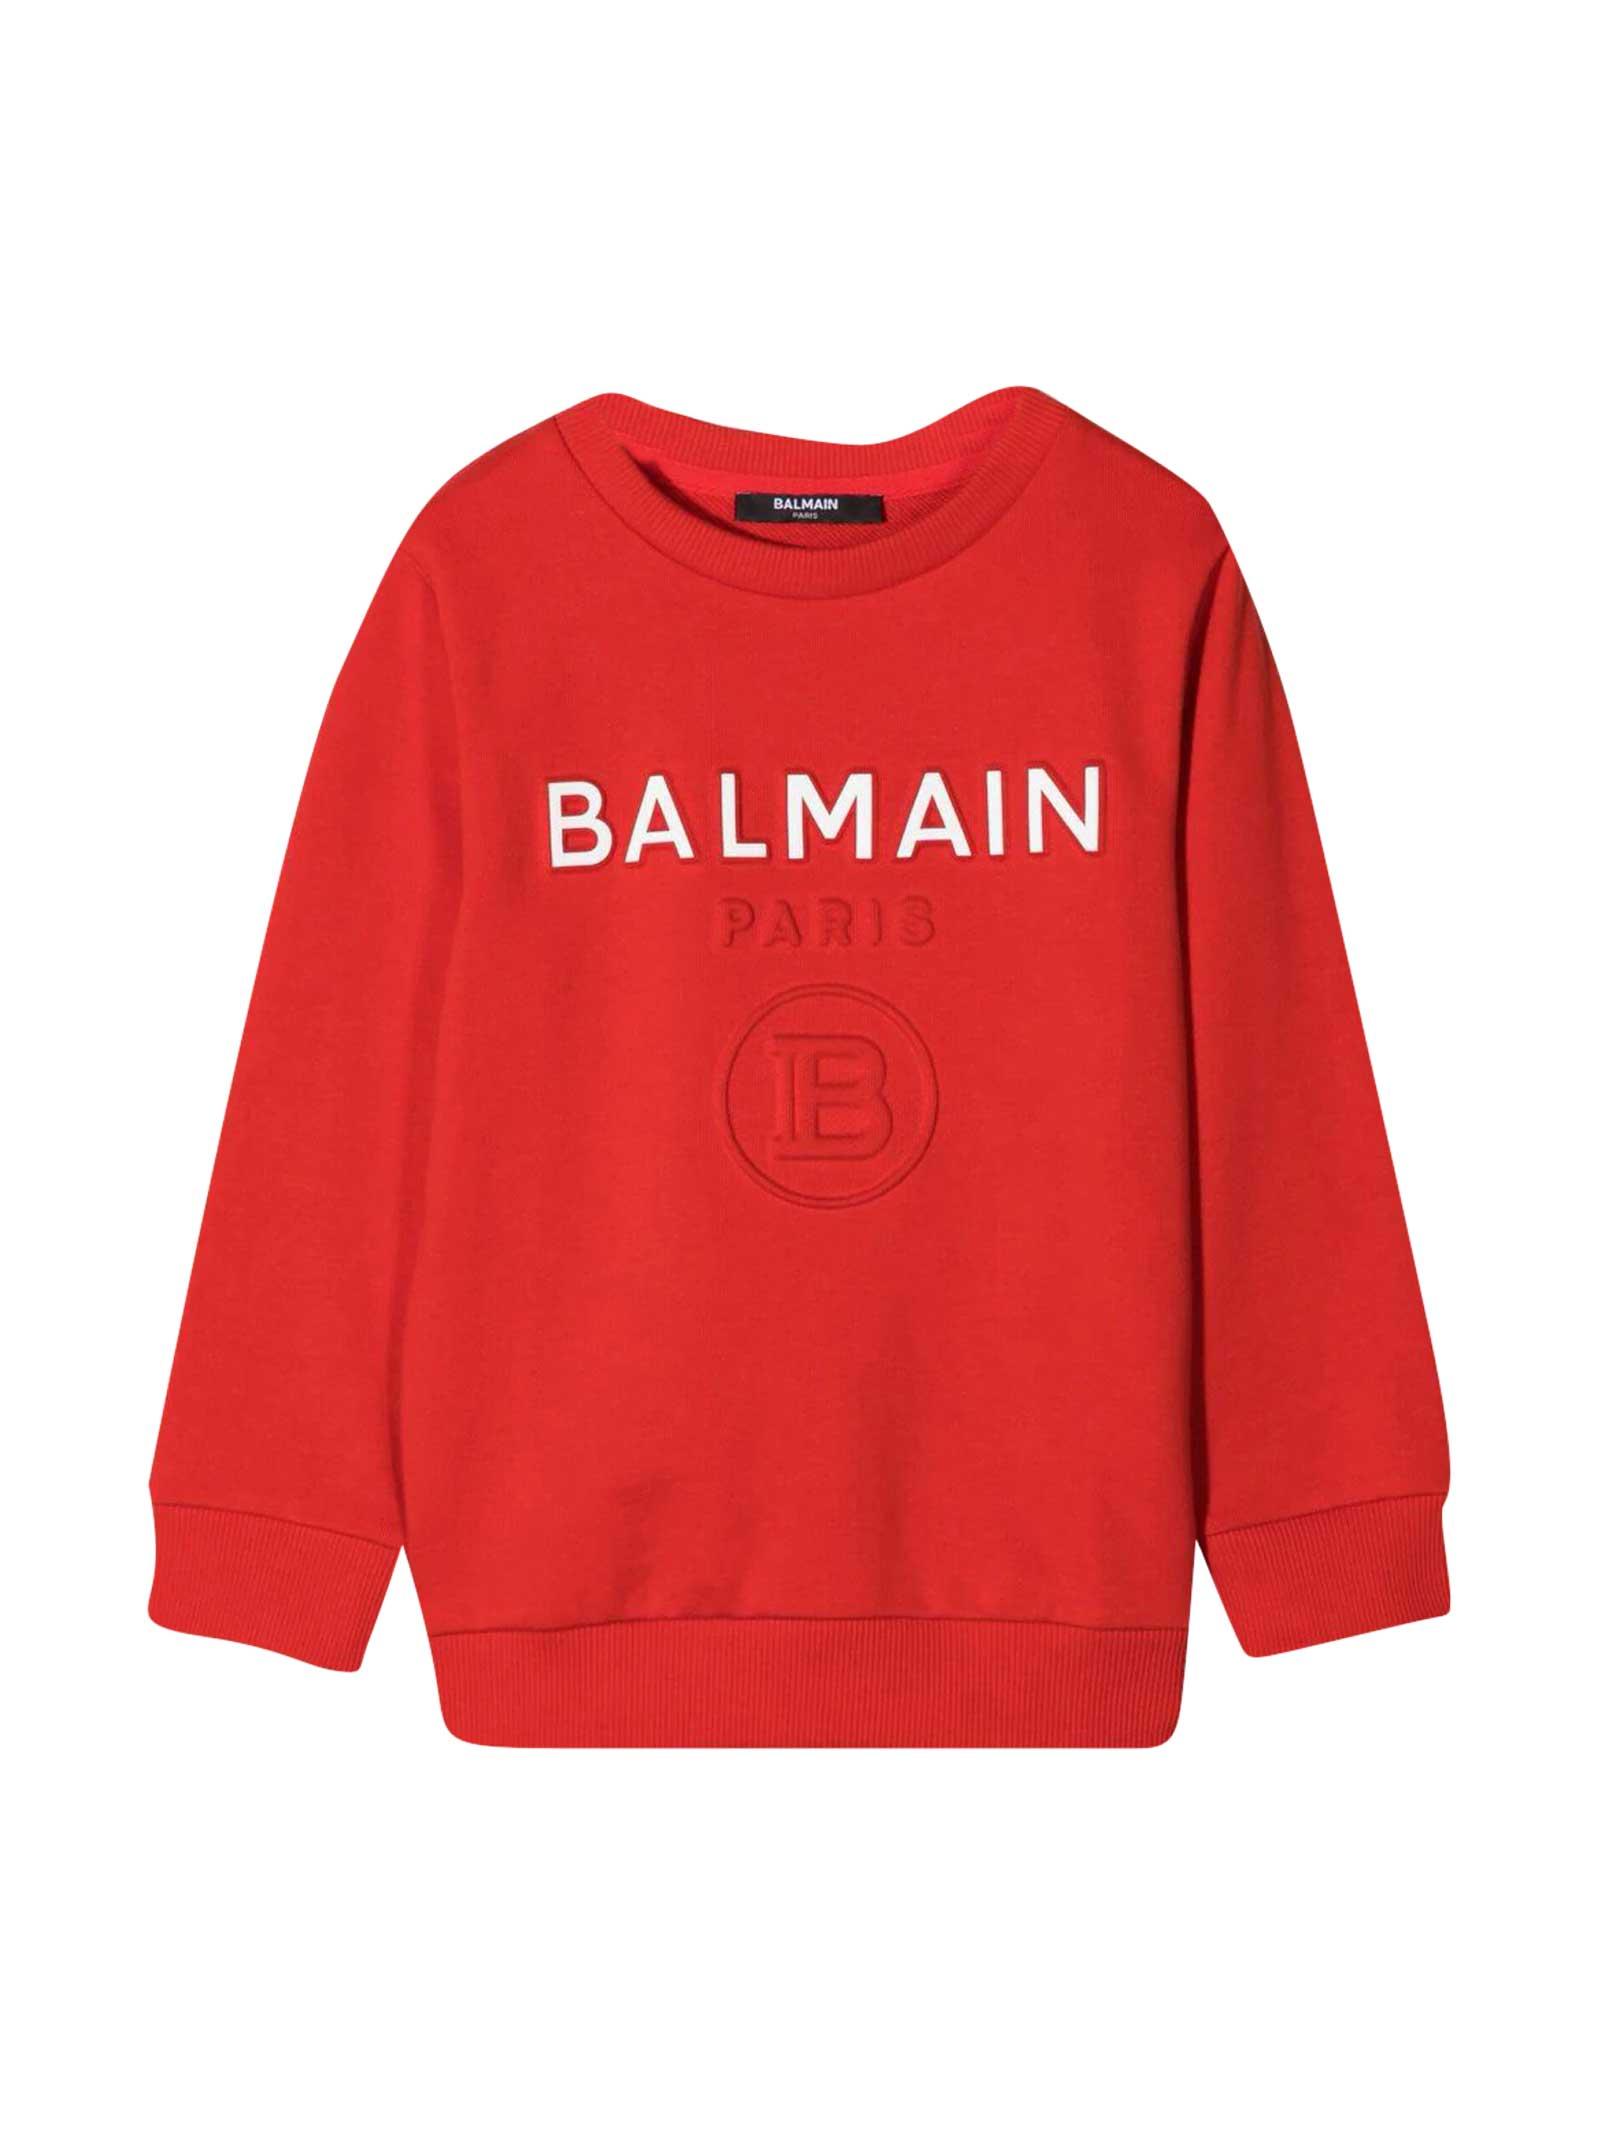 Balmain Sweatshirt With Press